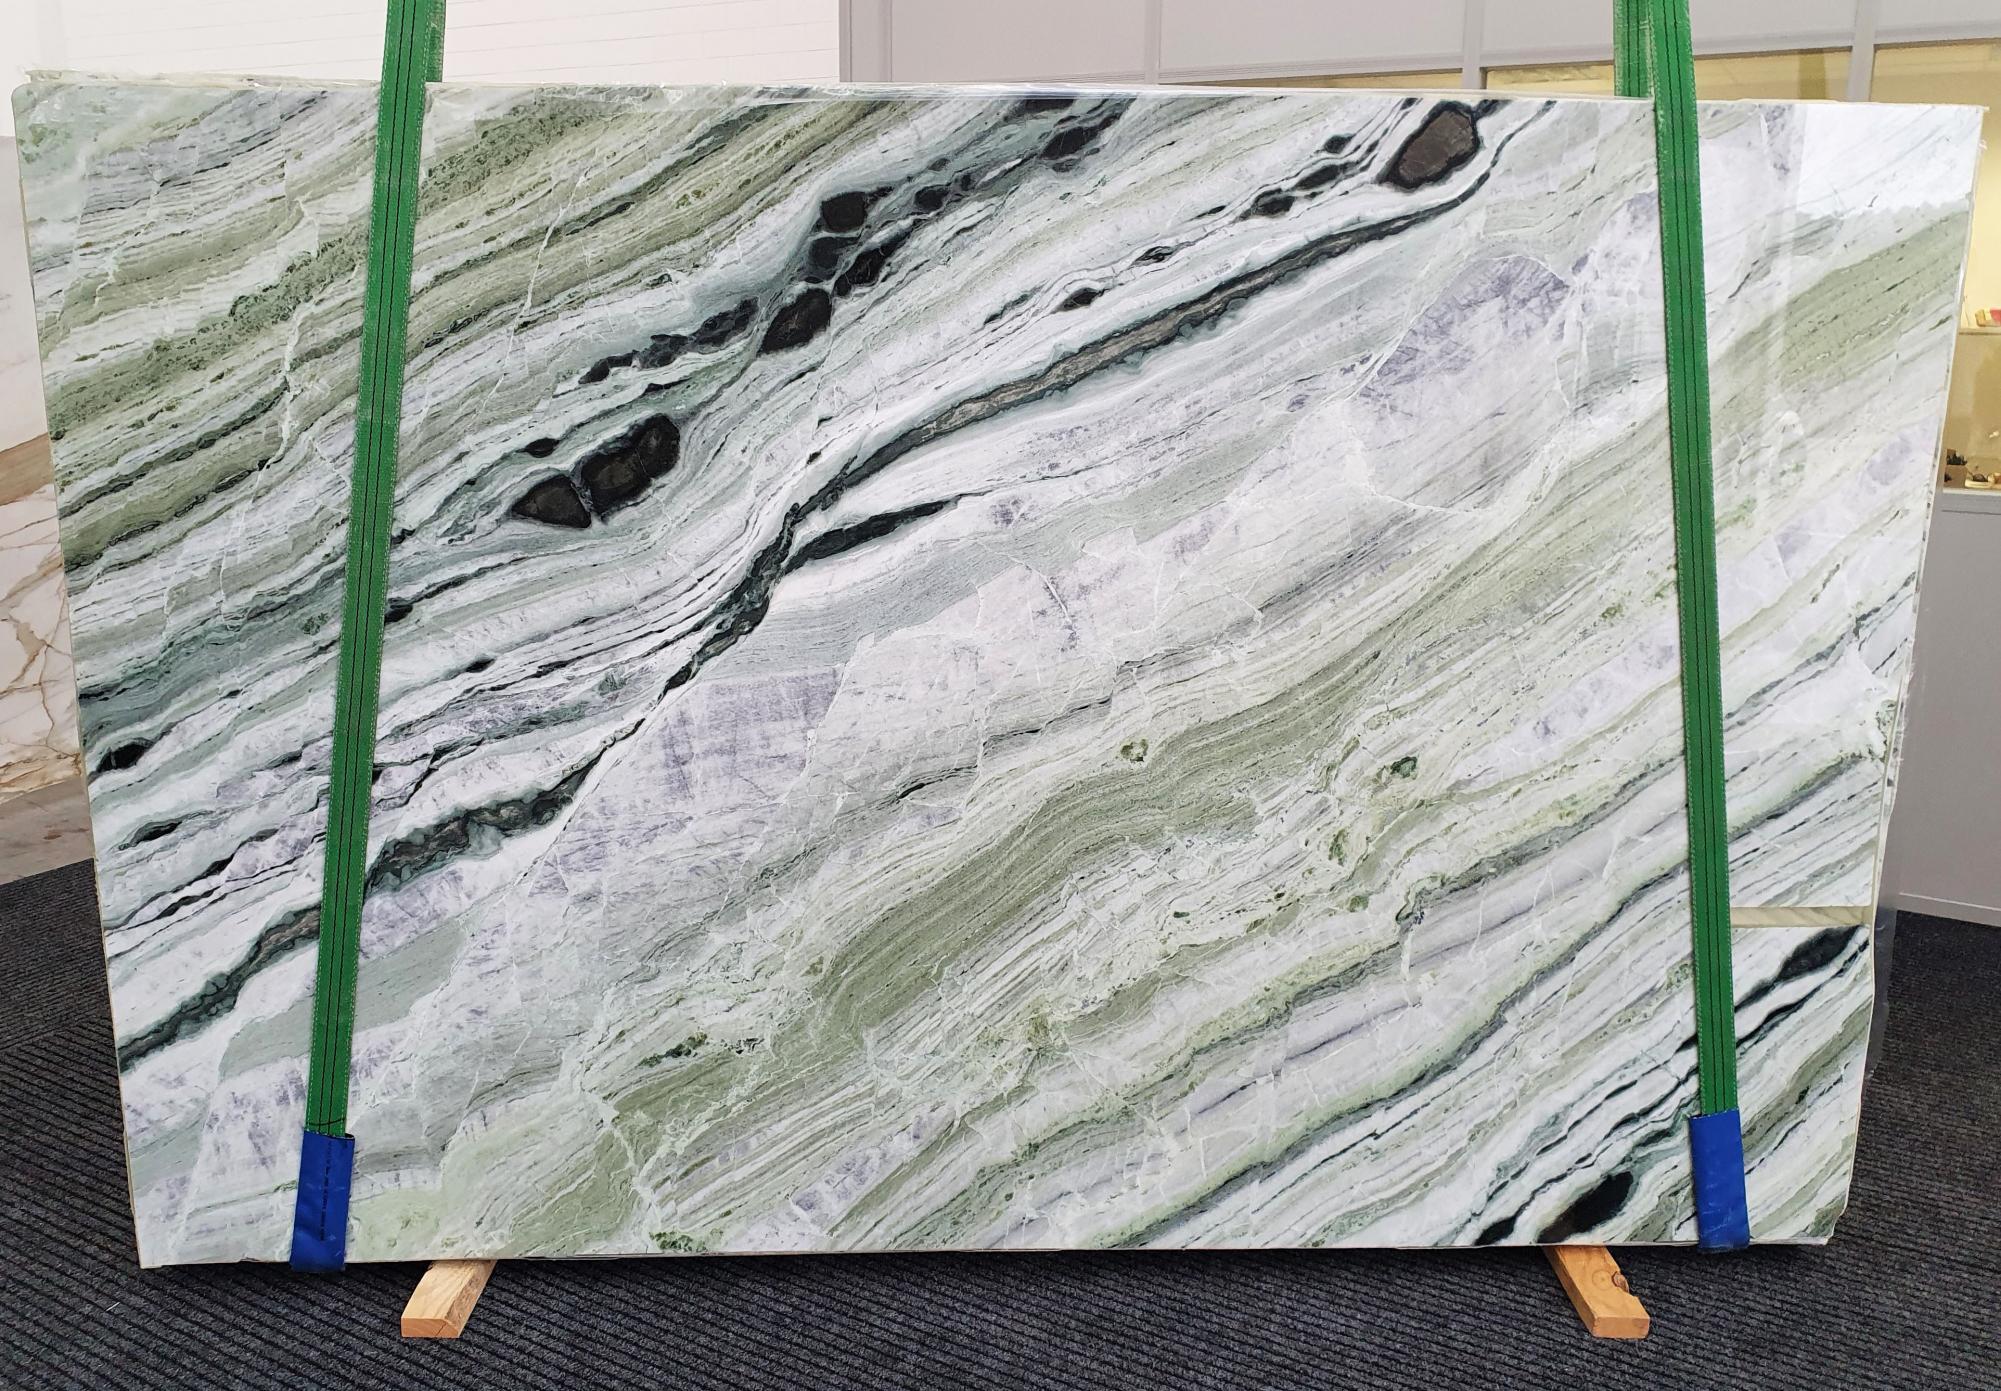 GREEN BEAUTY polierte Unmaßplatten 1452 aus Natur Marmor , Slab #30: Lieferung Veneto, Italien